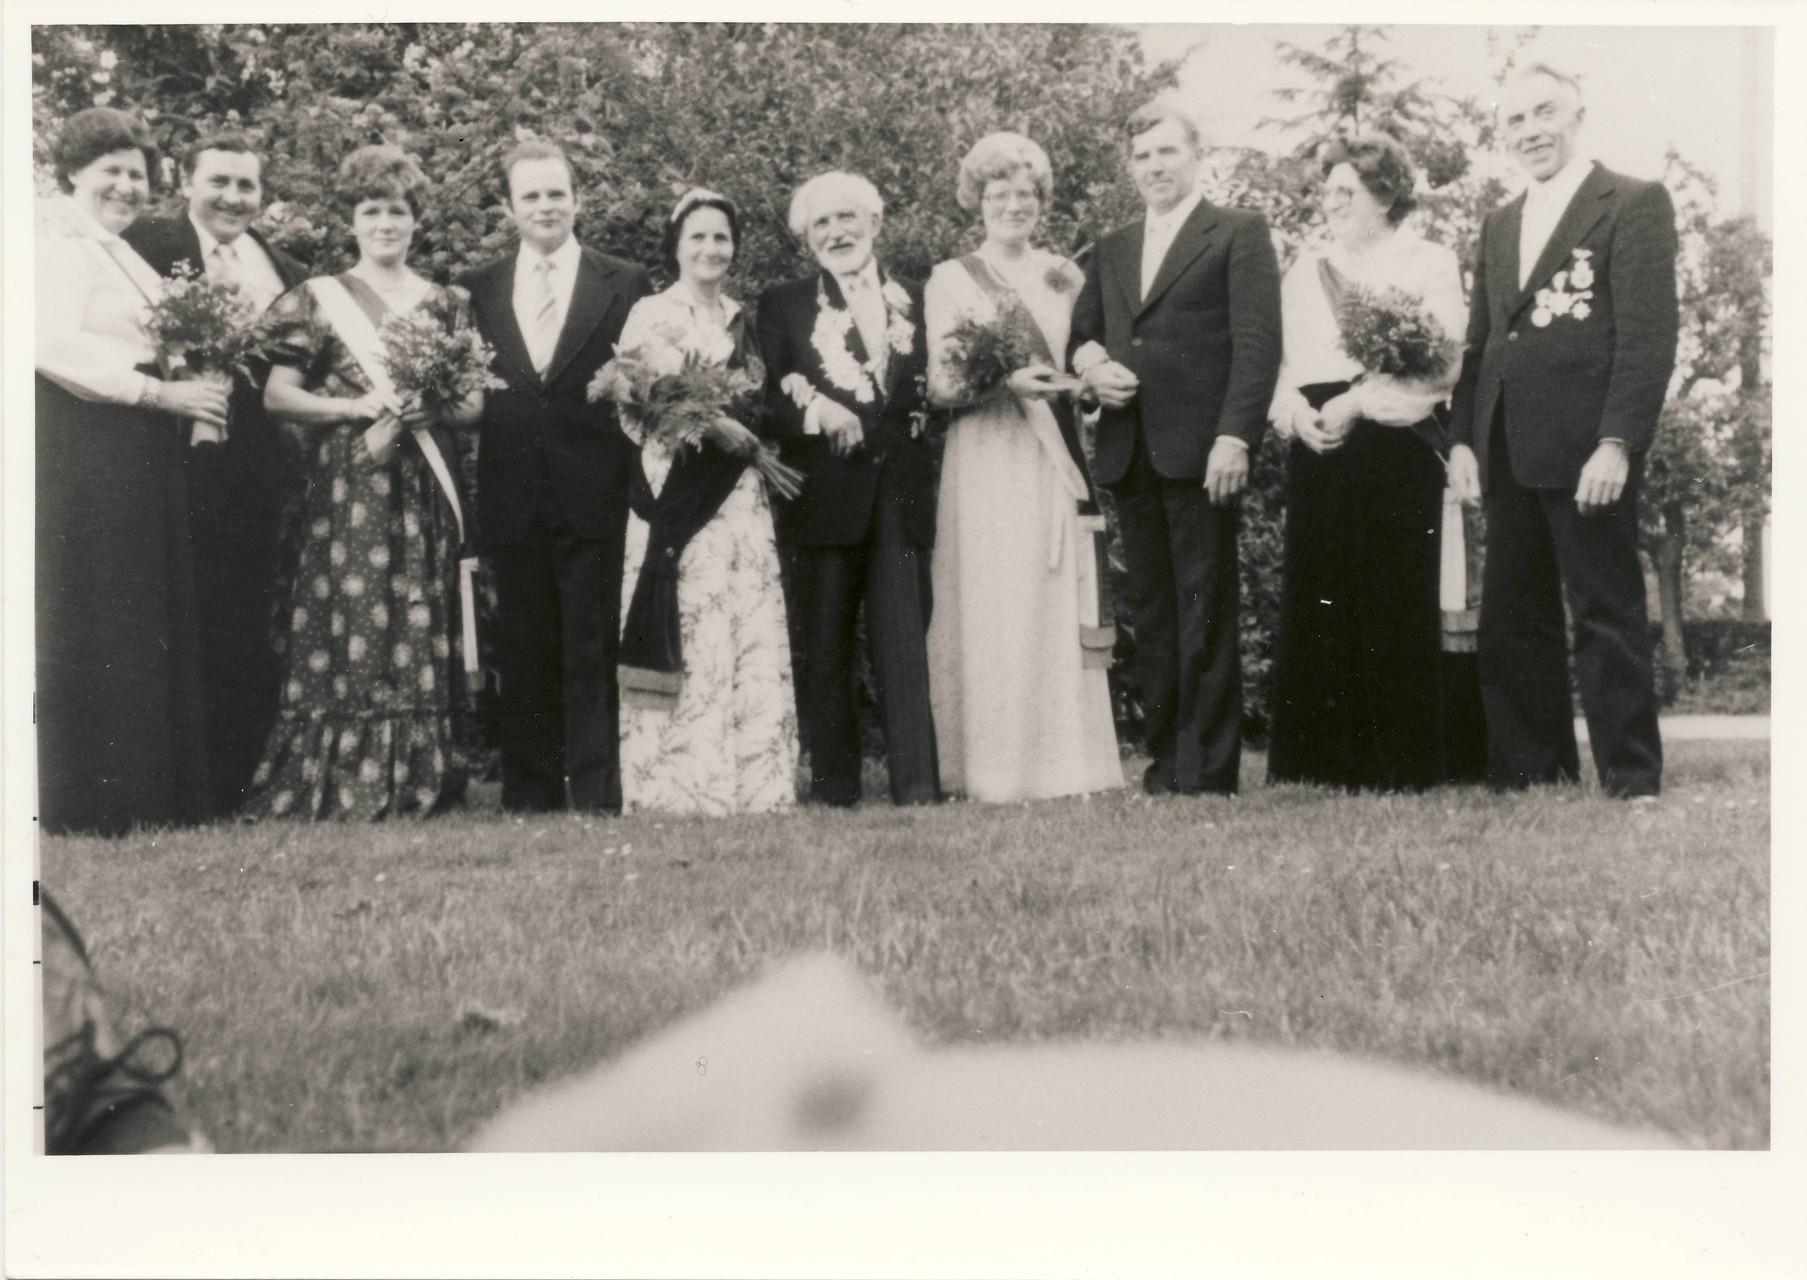 1979: König Matthias Quaedvlieg und Königin Anni Quaedvlieg